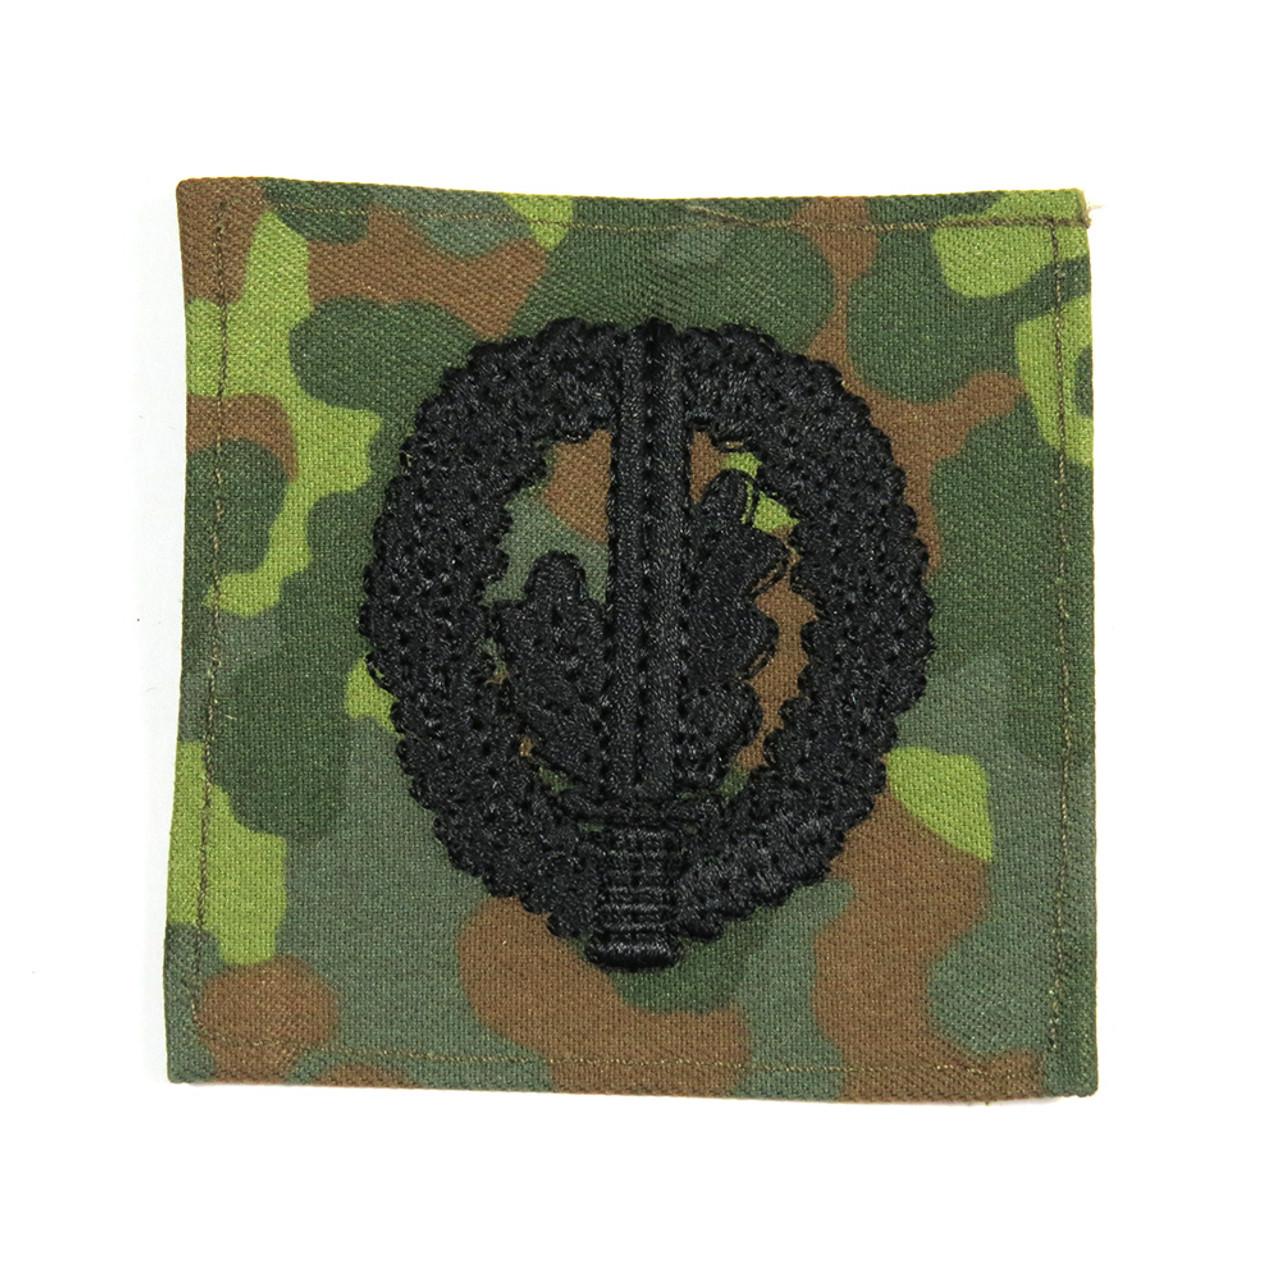 Flecktarn Kommandosoldat Patch (Subdued)